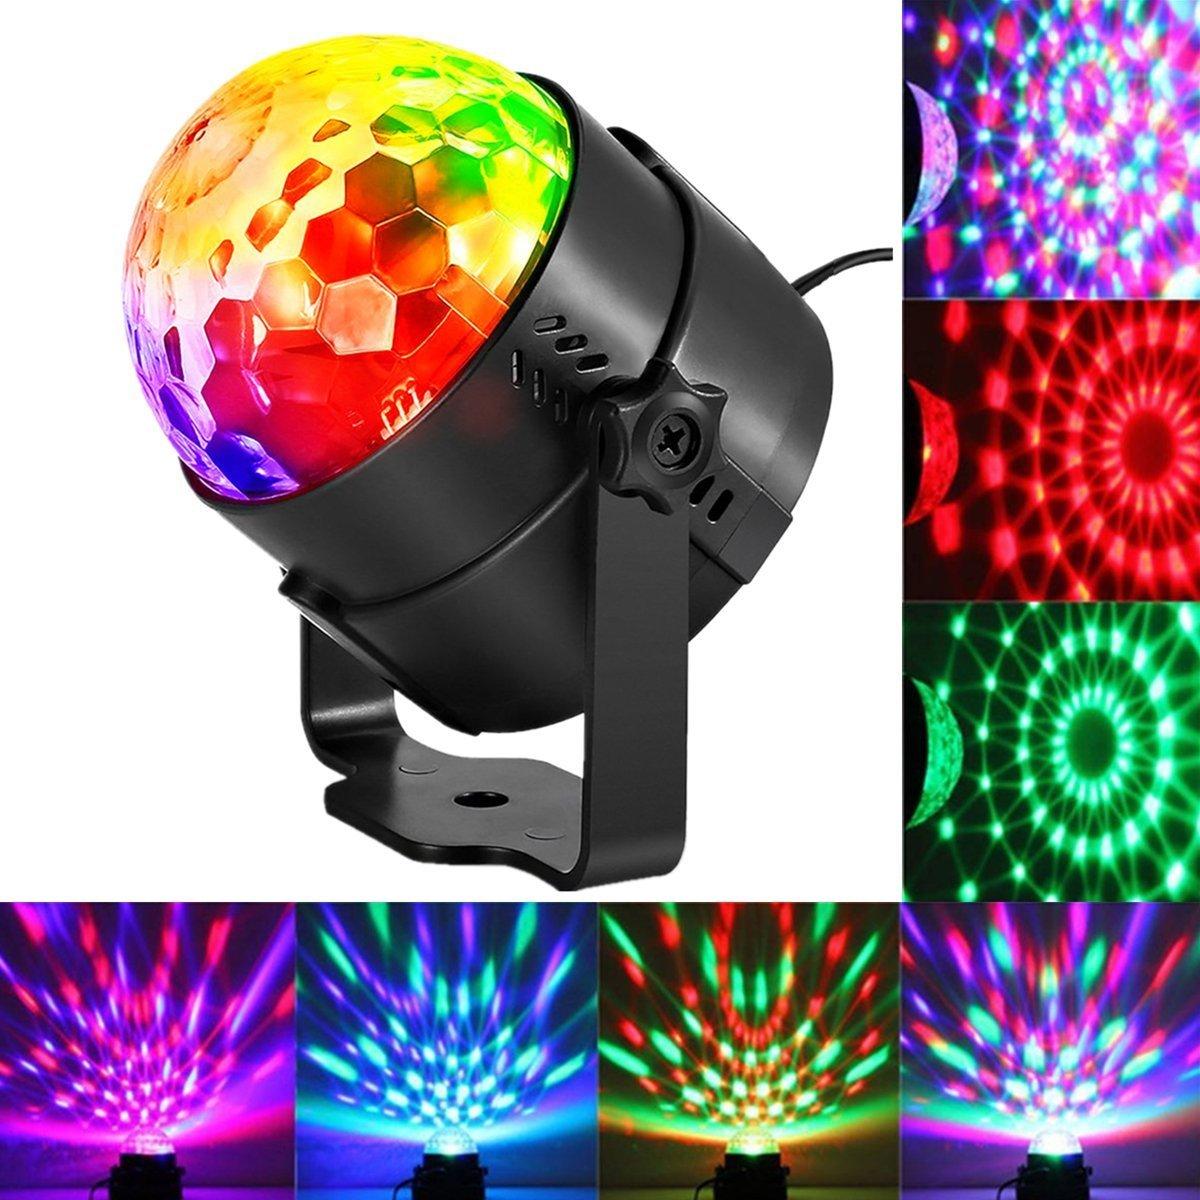 KINGSO 5W 100-240V Luz de la Etapa Etapa de Iluminació n Noche Mini Proyector RGB/GVB LED Etapa Luz para KTV, Bar, Disco DJ, Atmó sfera Bombilla de Luz de Cristal con Control de Sonido Negro